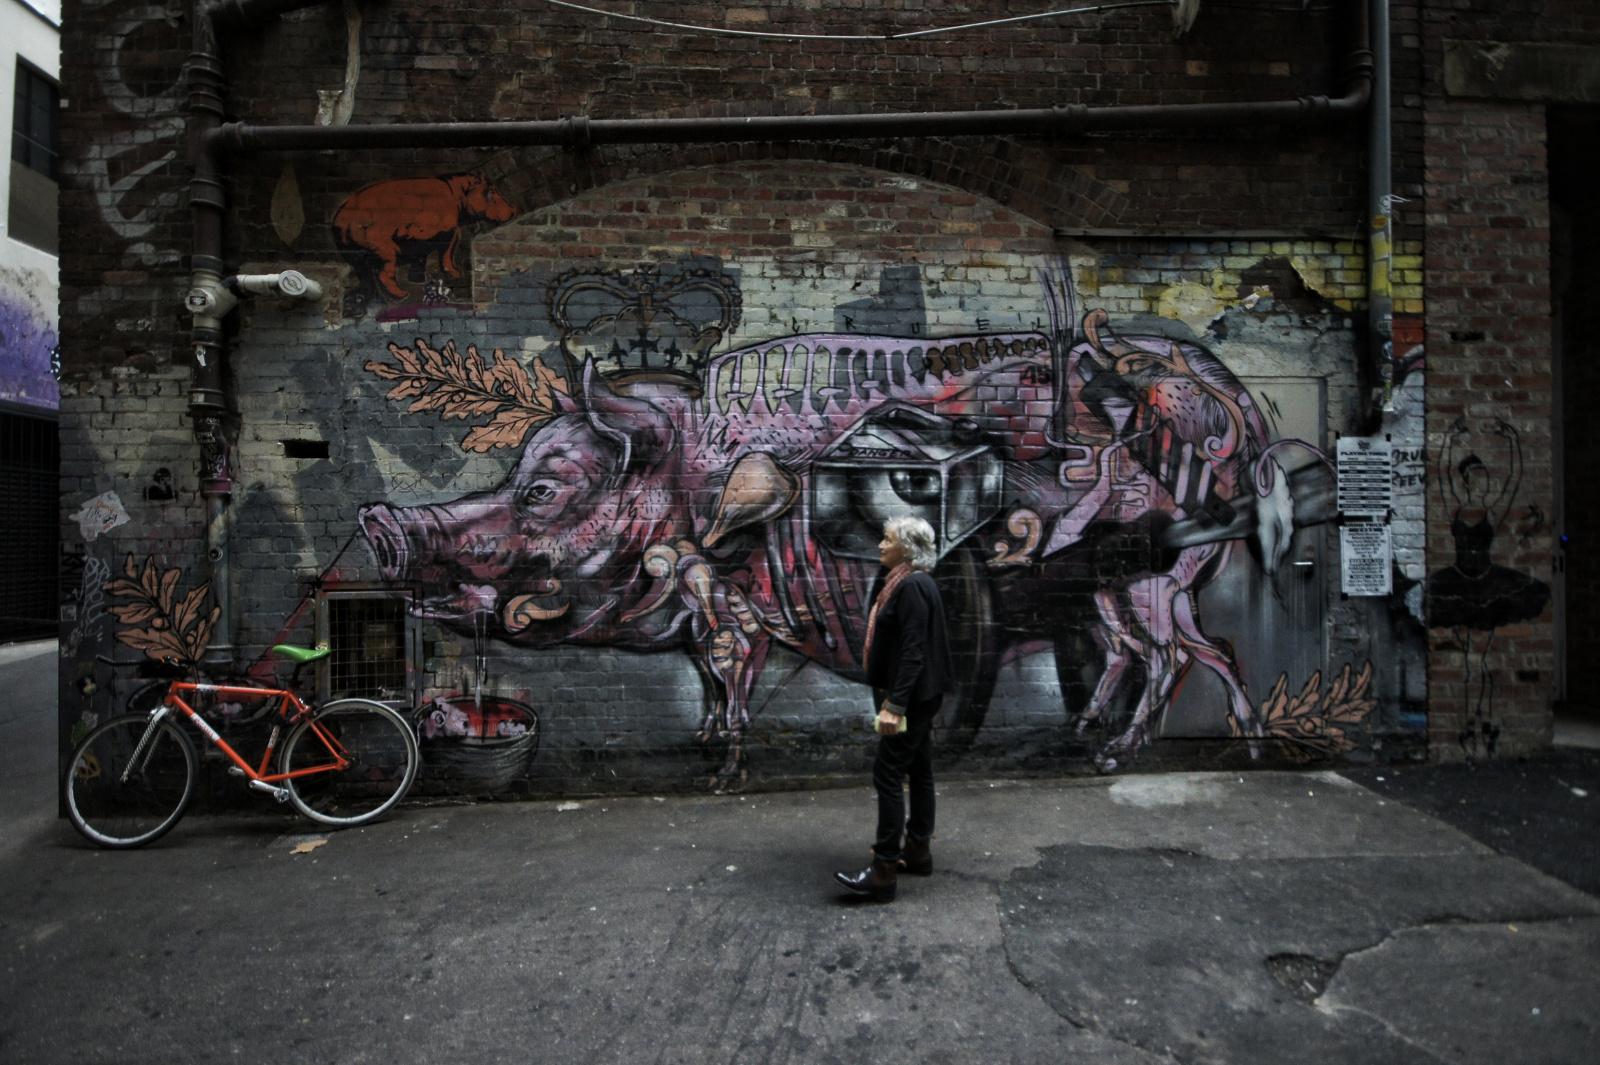 Kieran Rae Melbourne Australia Hosier Lane Street Art Graffiti